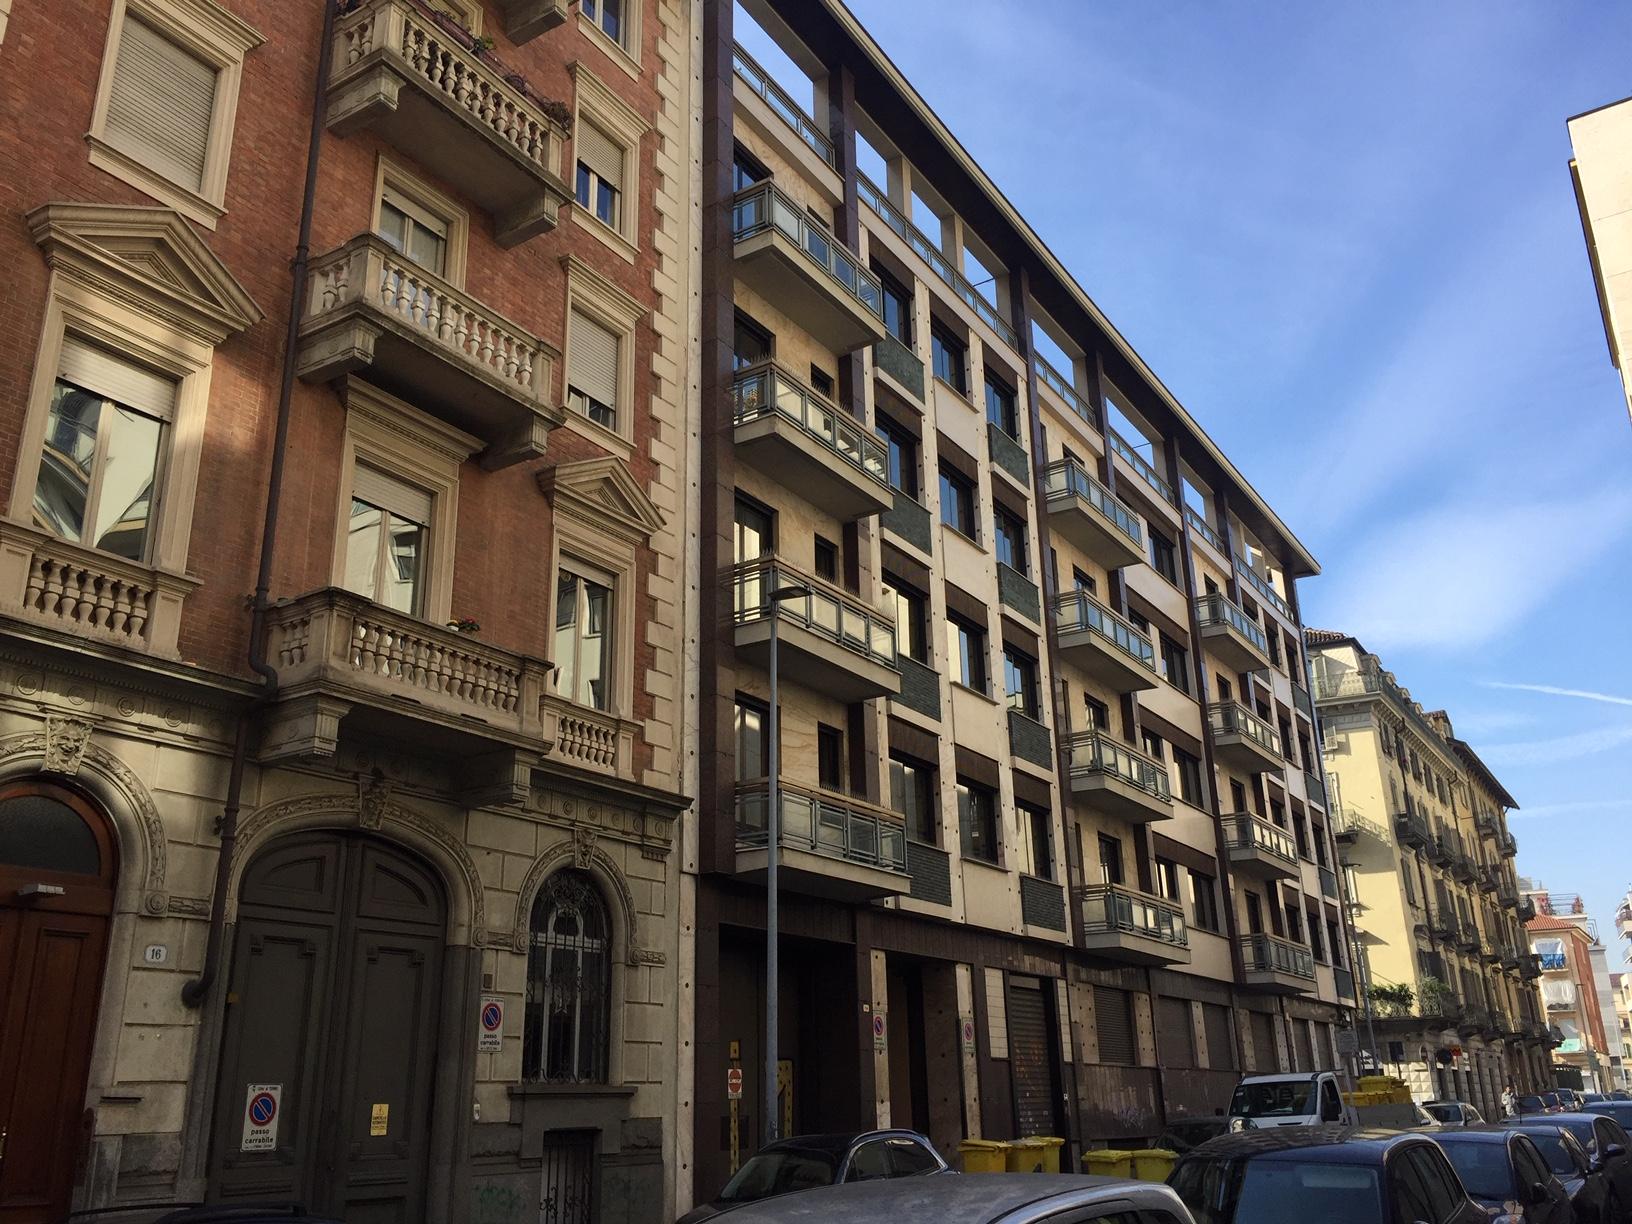 via Belfiore 23, Torino